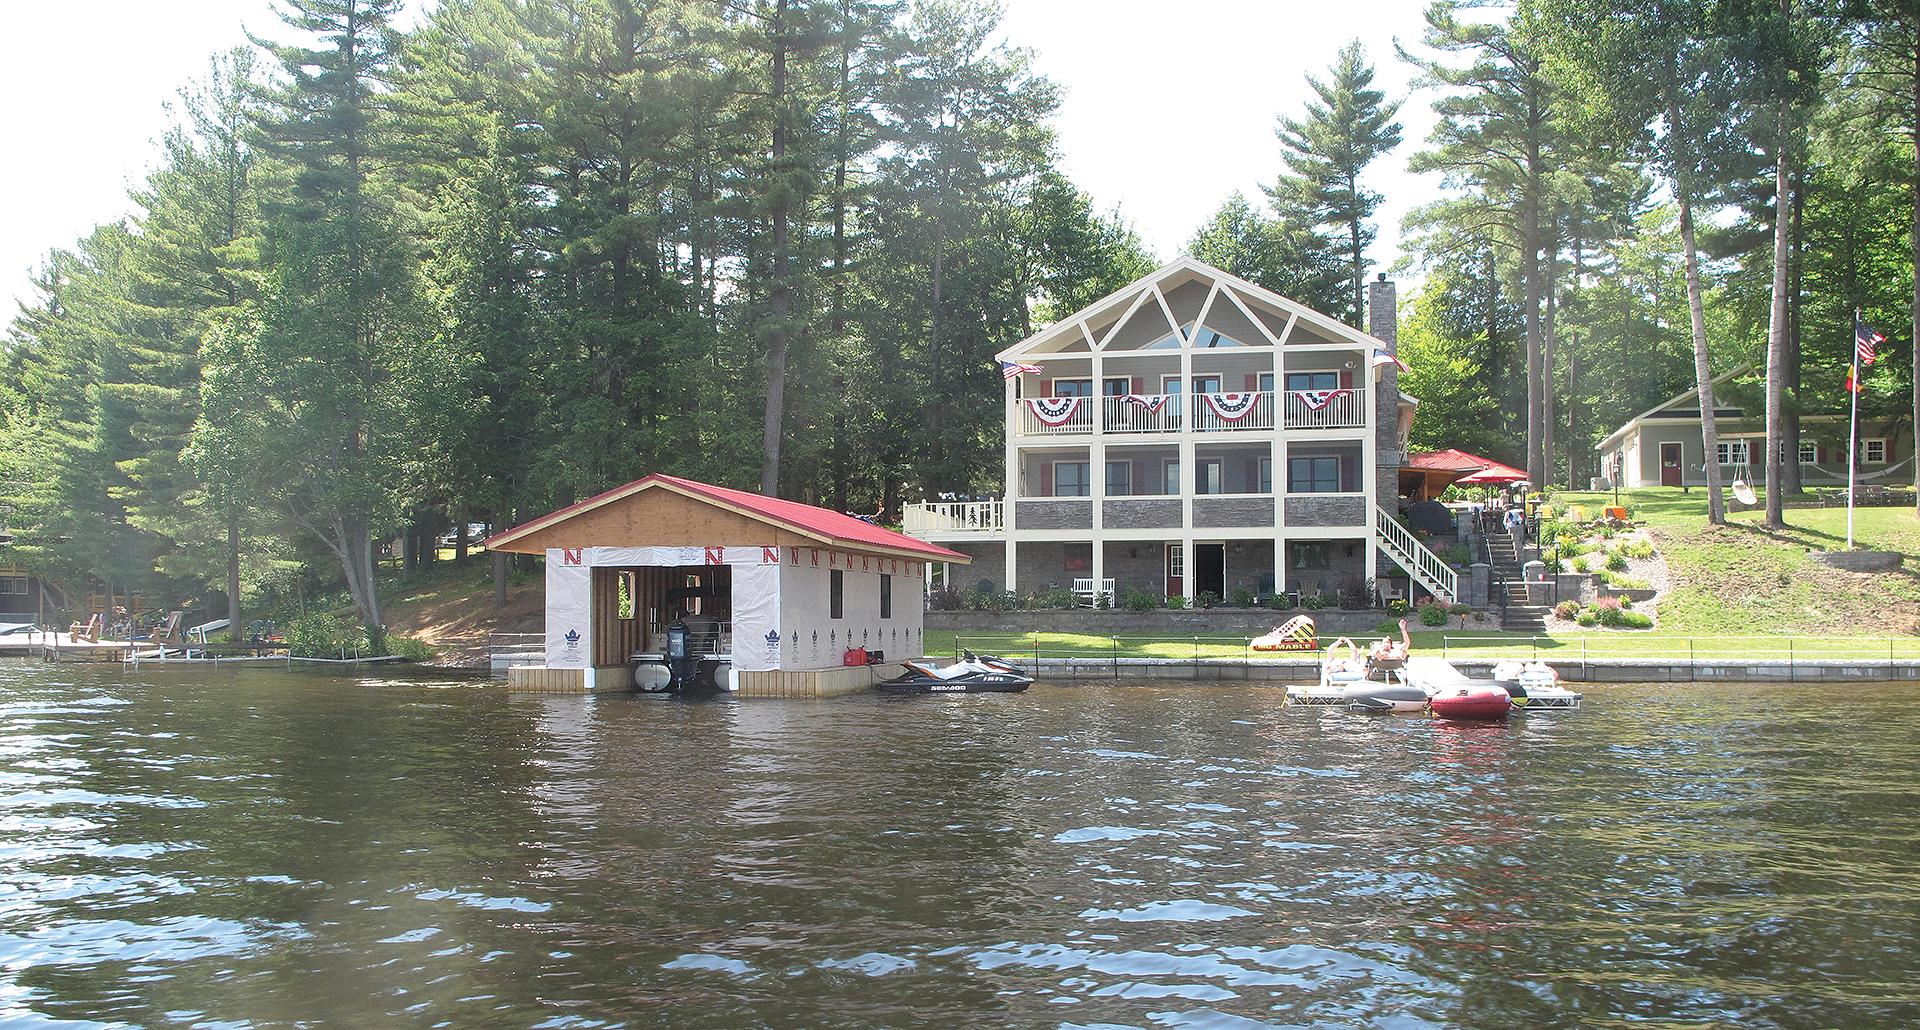 Brantingham Lake New York Brantingham Lake Rentals Brantingham Lake House